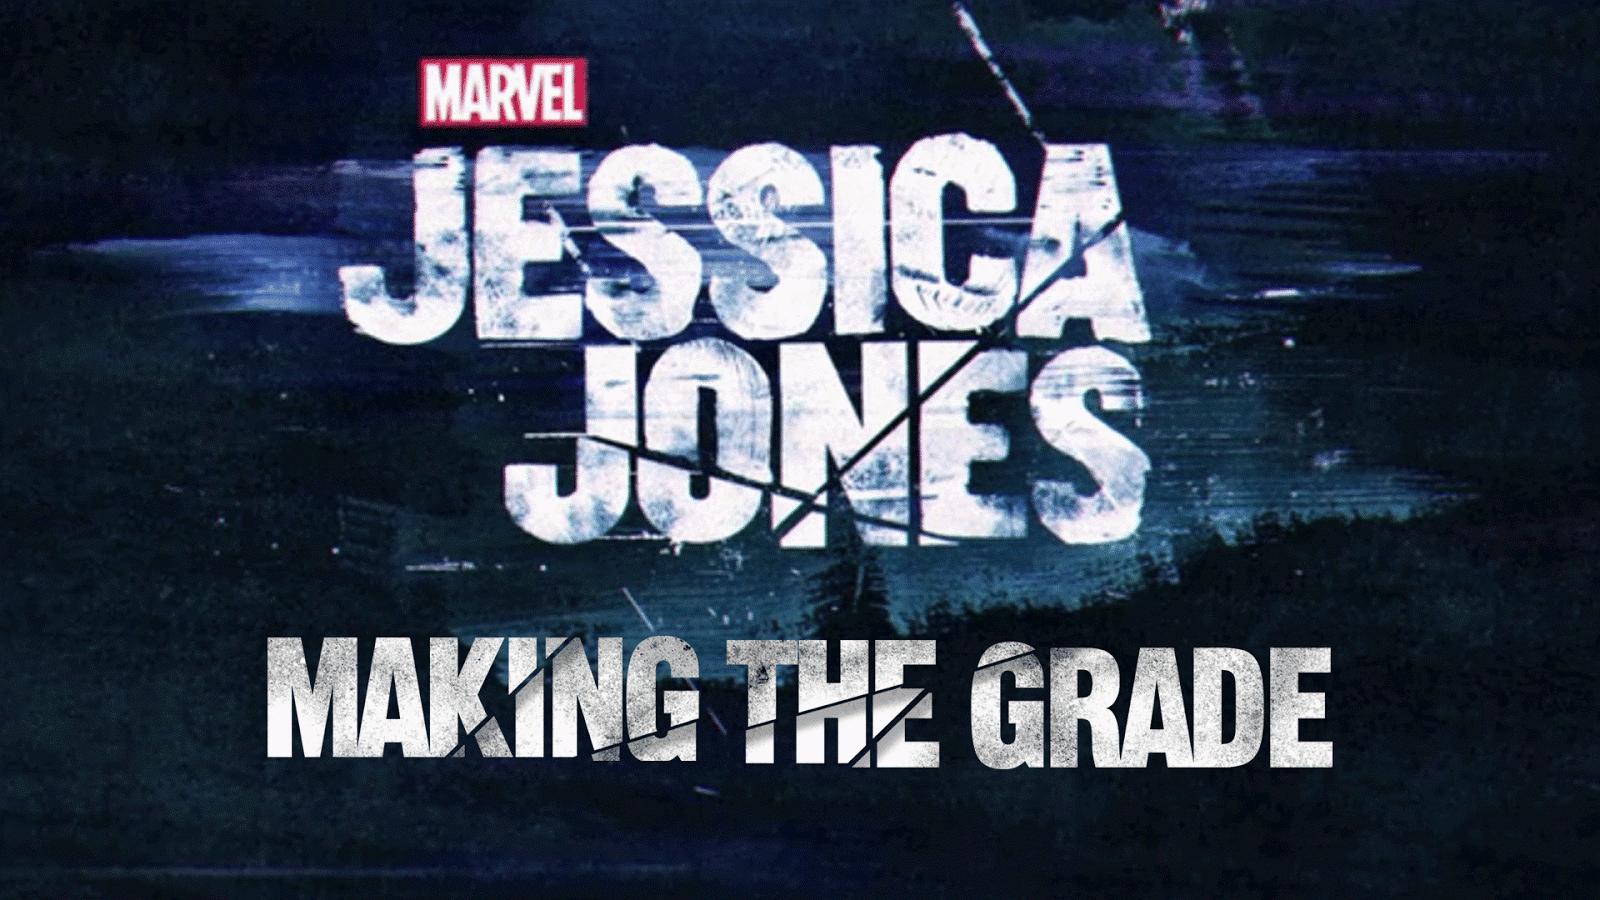 HD Jessica Jones Season 1 photos screen shots poster